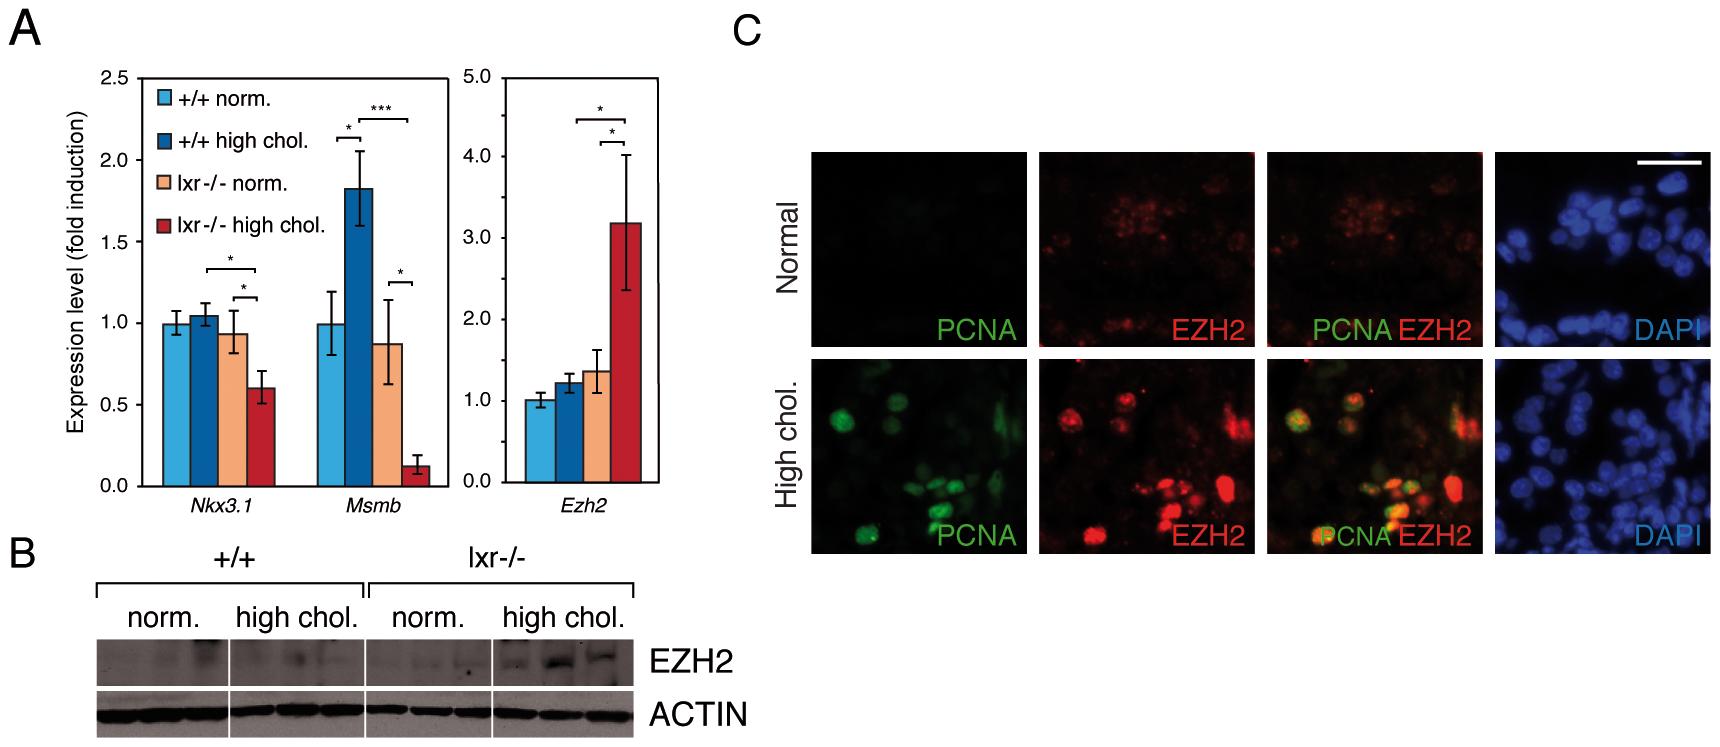 Disruption of cholesterol homeostasis induces the repression of <i>Nkx3.1</i> and <i>Msmb</i> tumor suppressor genes and upregulation of the <i>Ezh2</i> histone methyltransferase gene.